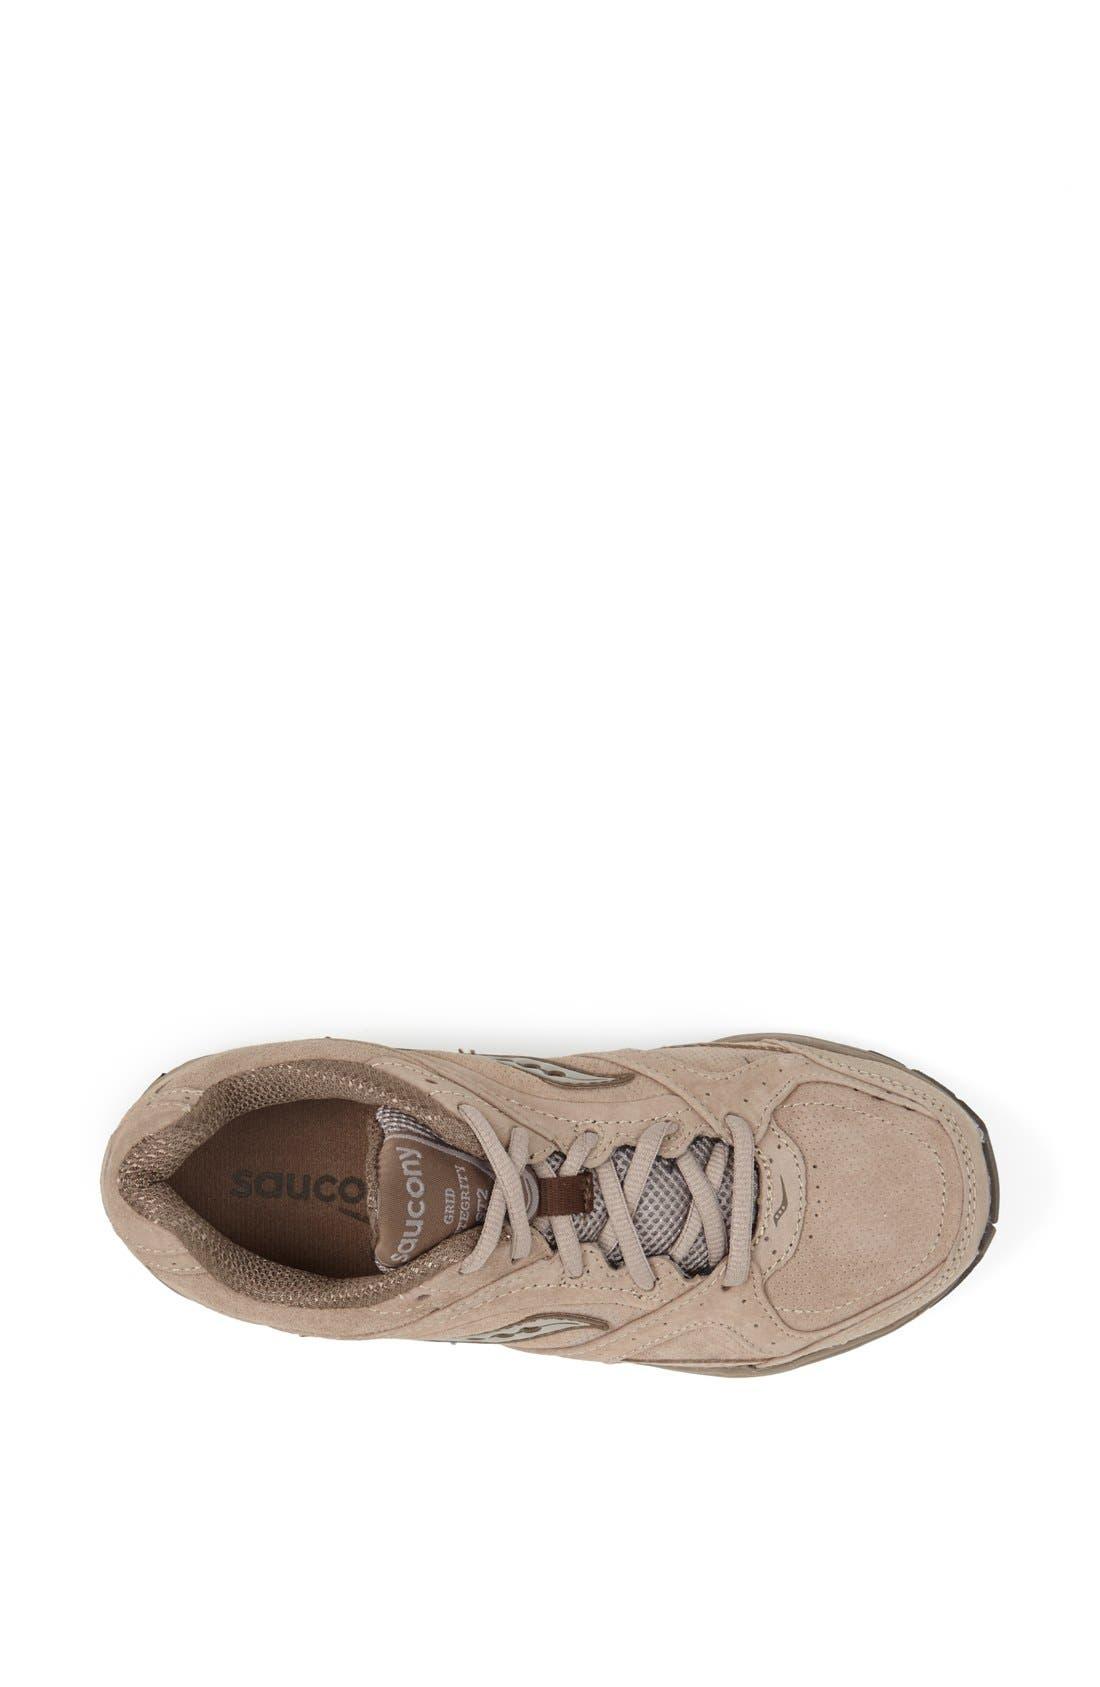 Alternate Image 3  - Saucony 'Integrity ST2' Running Shoe (Women)